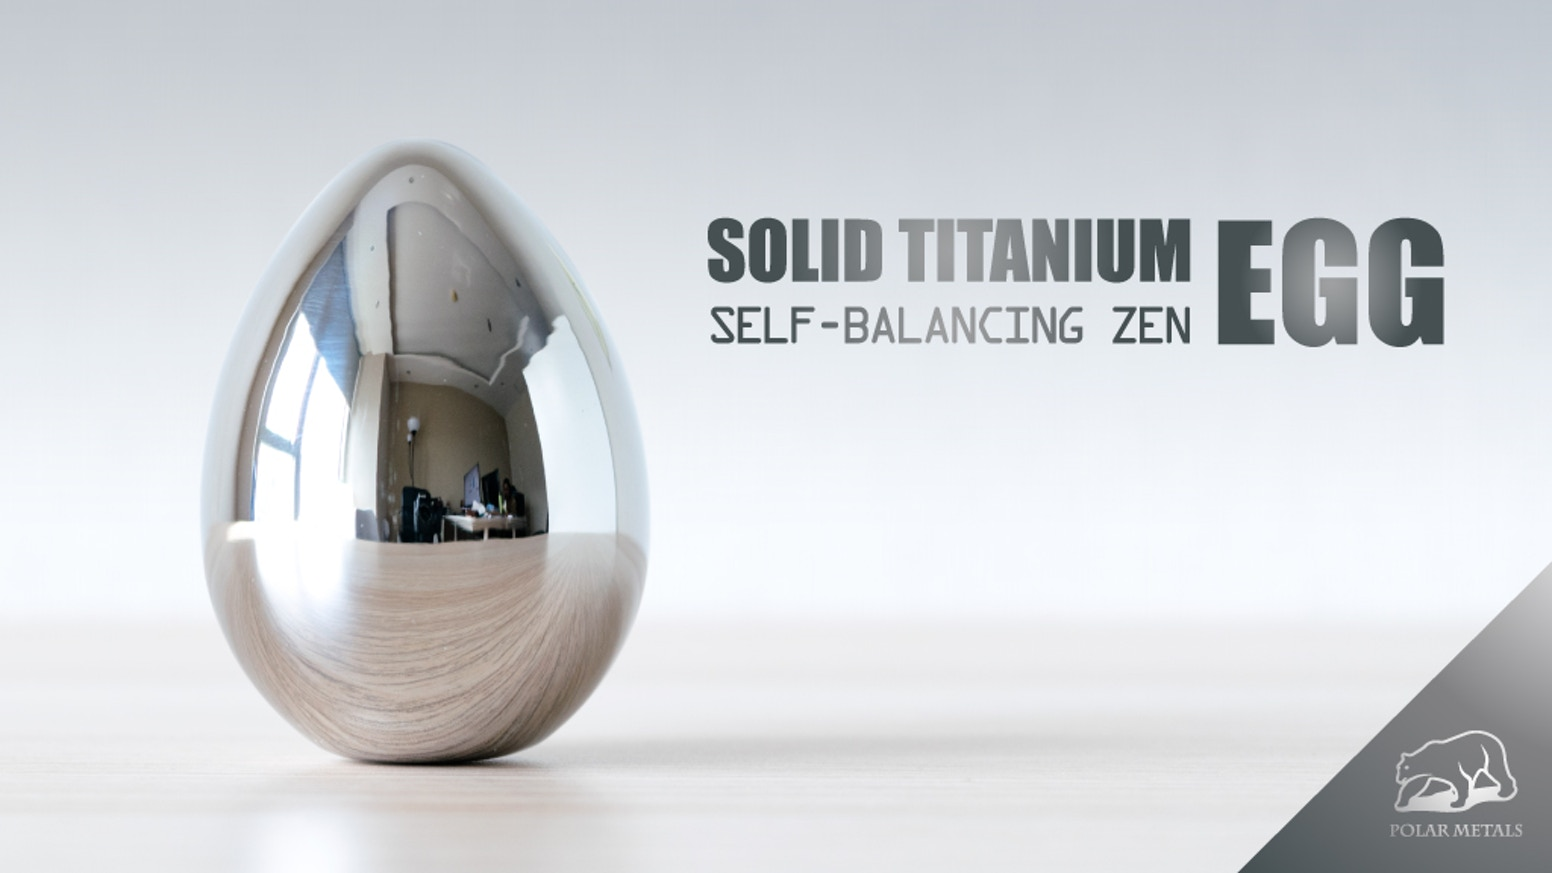 A balancing egg made of solid Ti6AL4V aerospace titanium! A great desk companion, social magnet and piece of art.